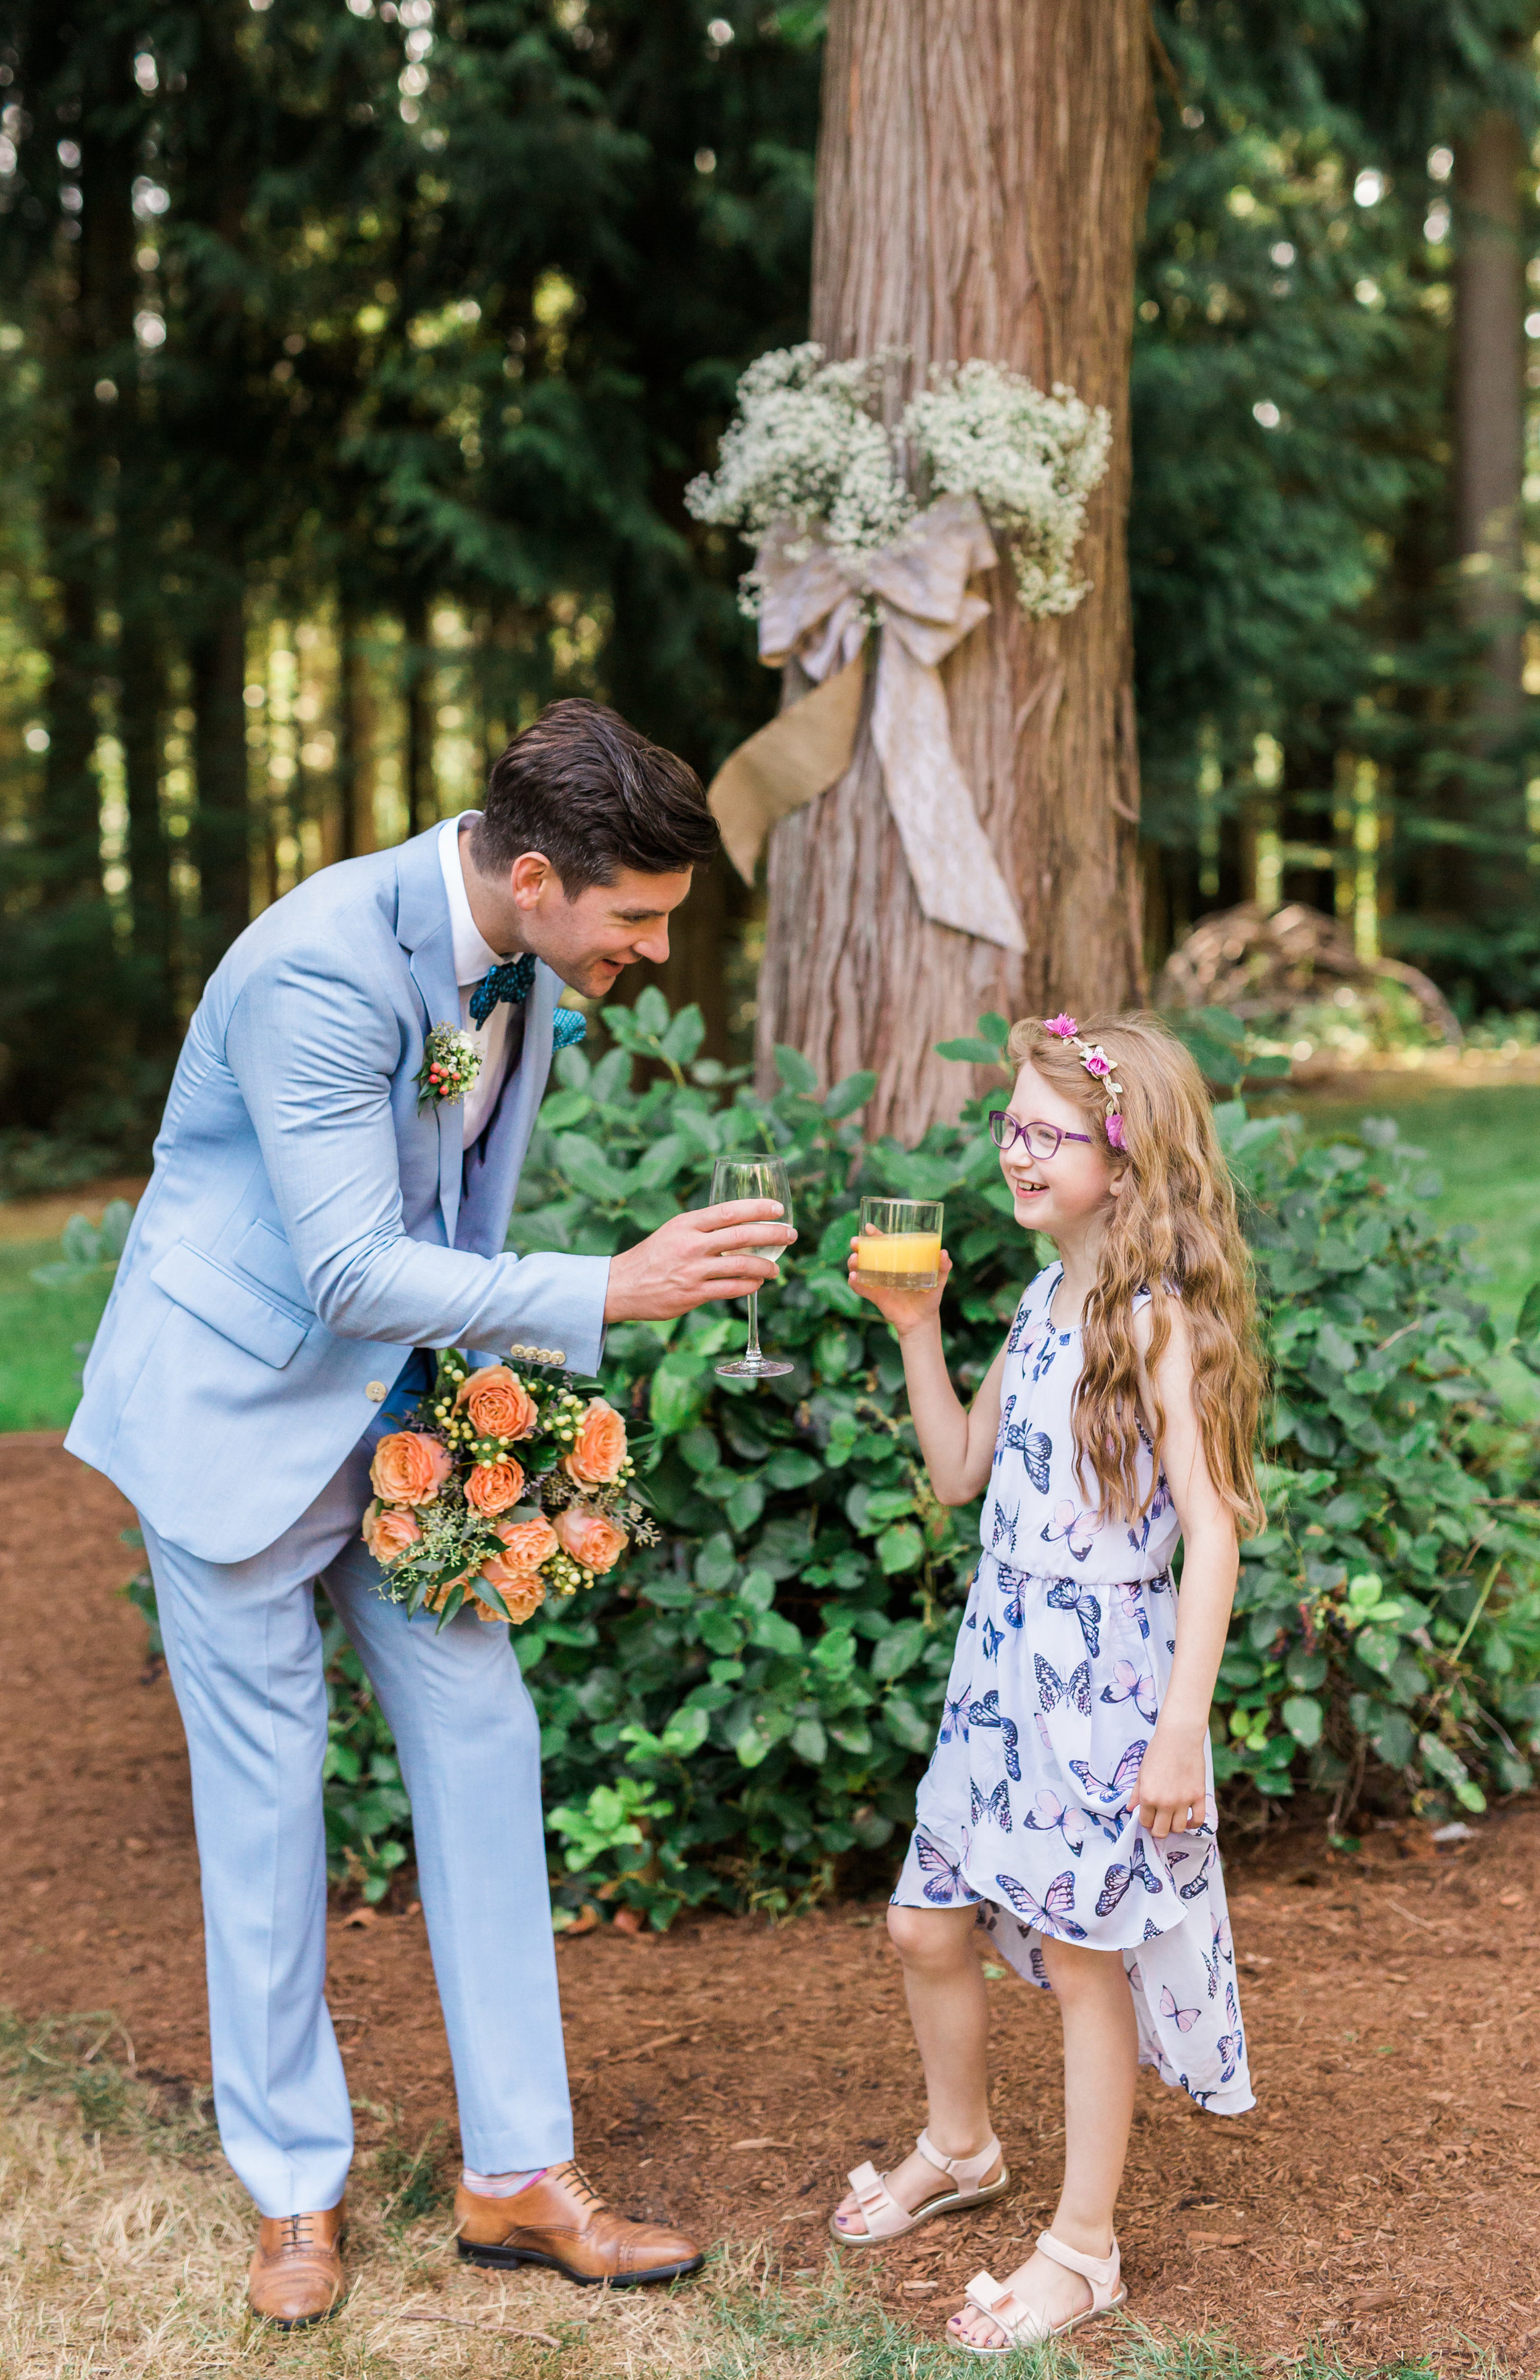 Linwood House Wedding Photos - Roberts Creek Wedding Photos - Vancouver Wedding Photographer & Videographer - Sunshine Coast Wedding Photos - Sunshine Coast Wedding Photographer - Jennifer Picard Photography - IMG_7792.jpg